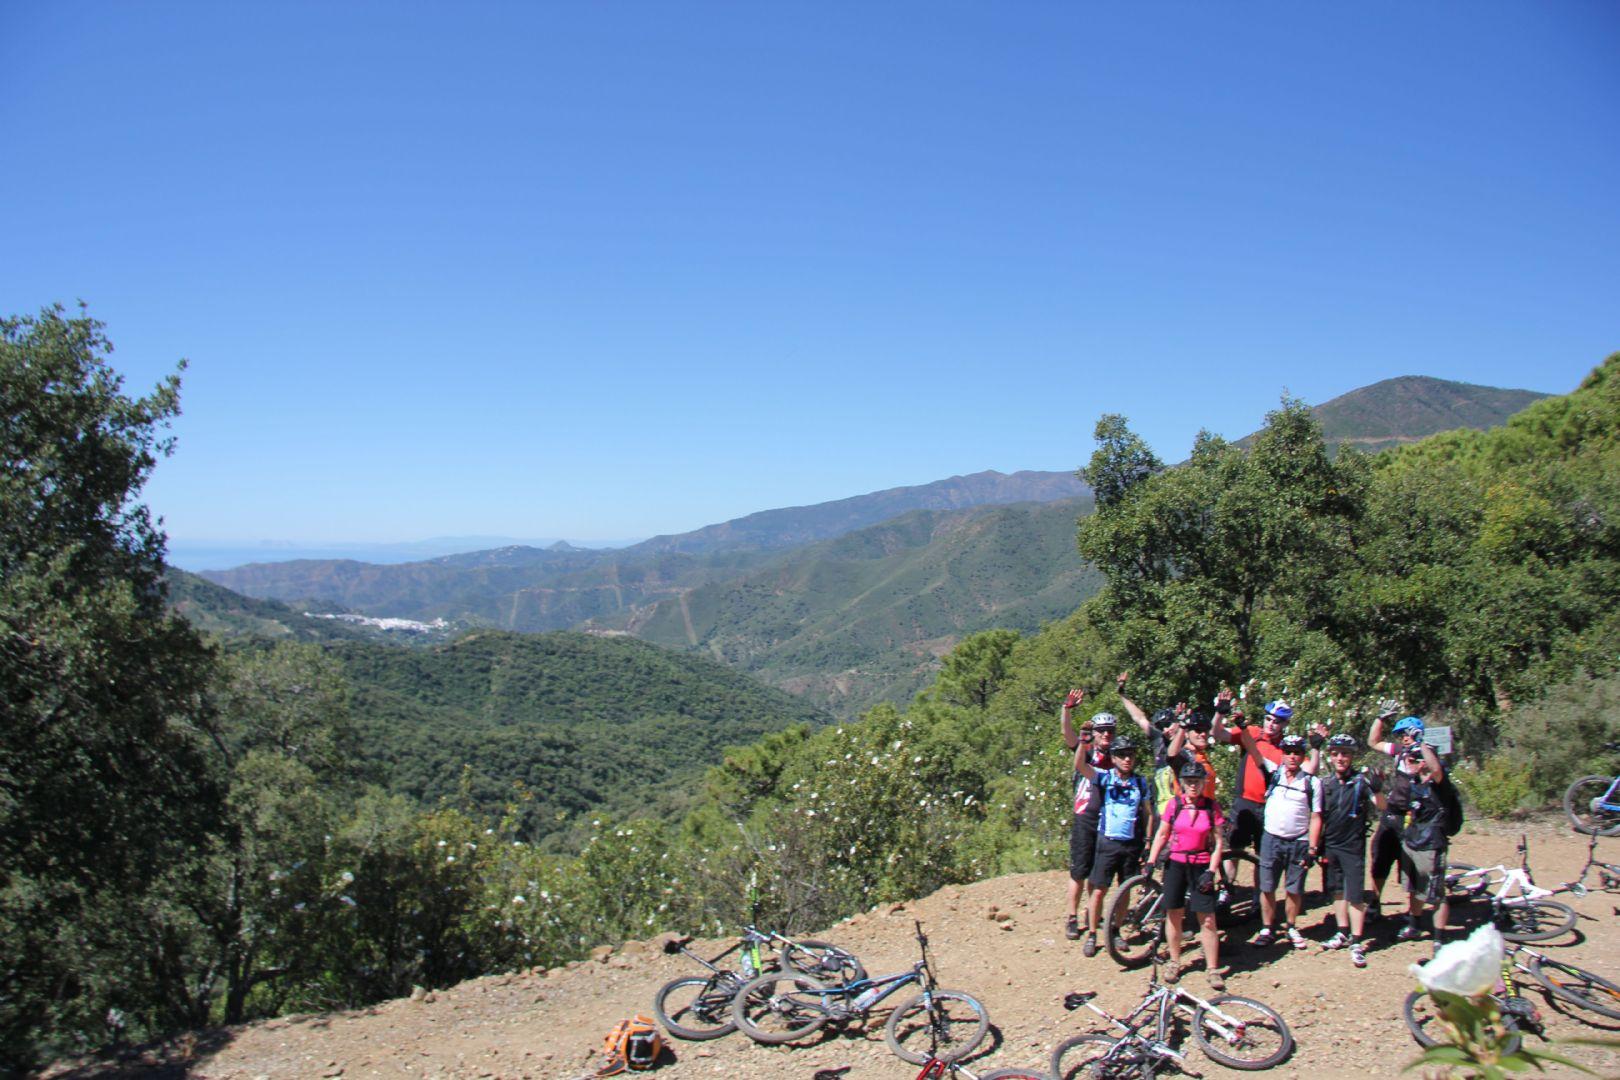 IMG_9062.JPG - Spain - Trans Andaluz - Mountain Biking